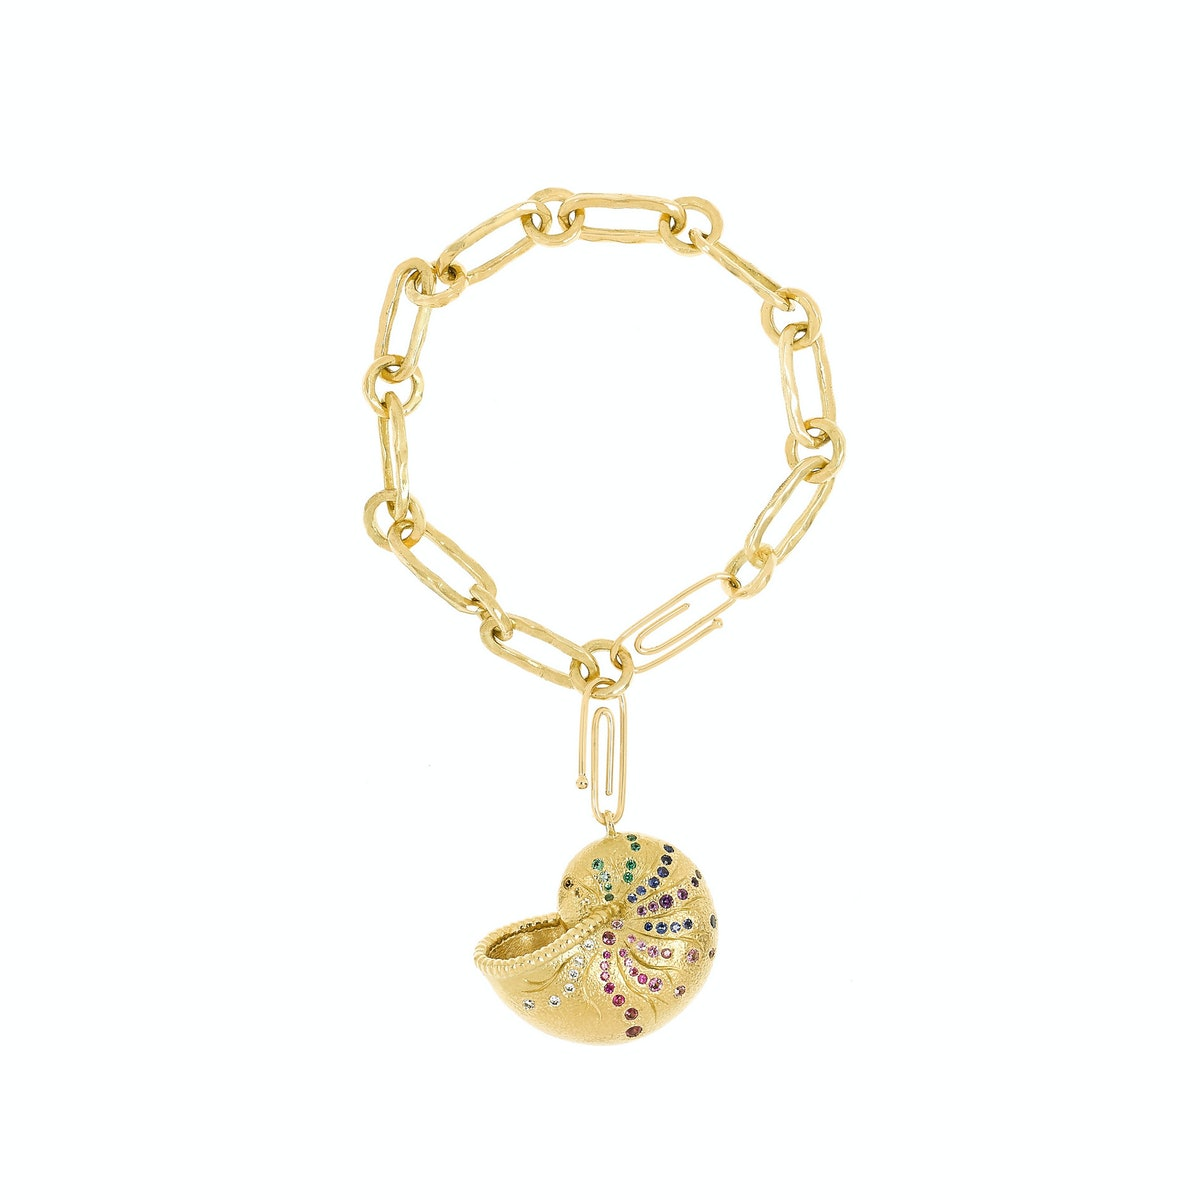 Aurelie Bidermann Fine Jewelry bracelet